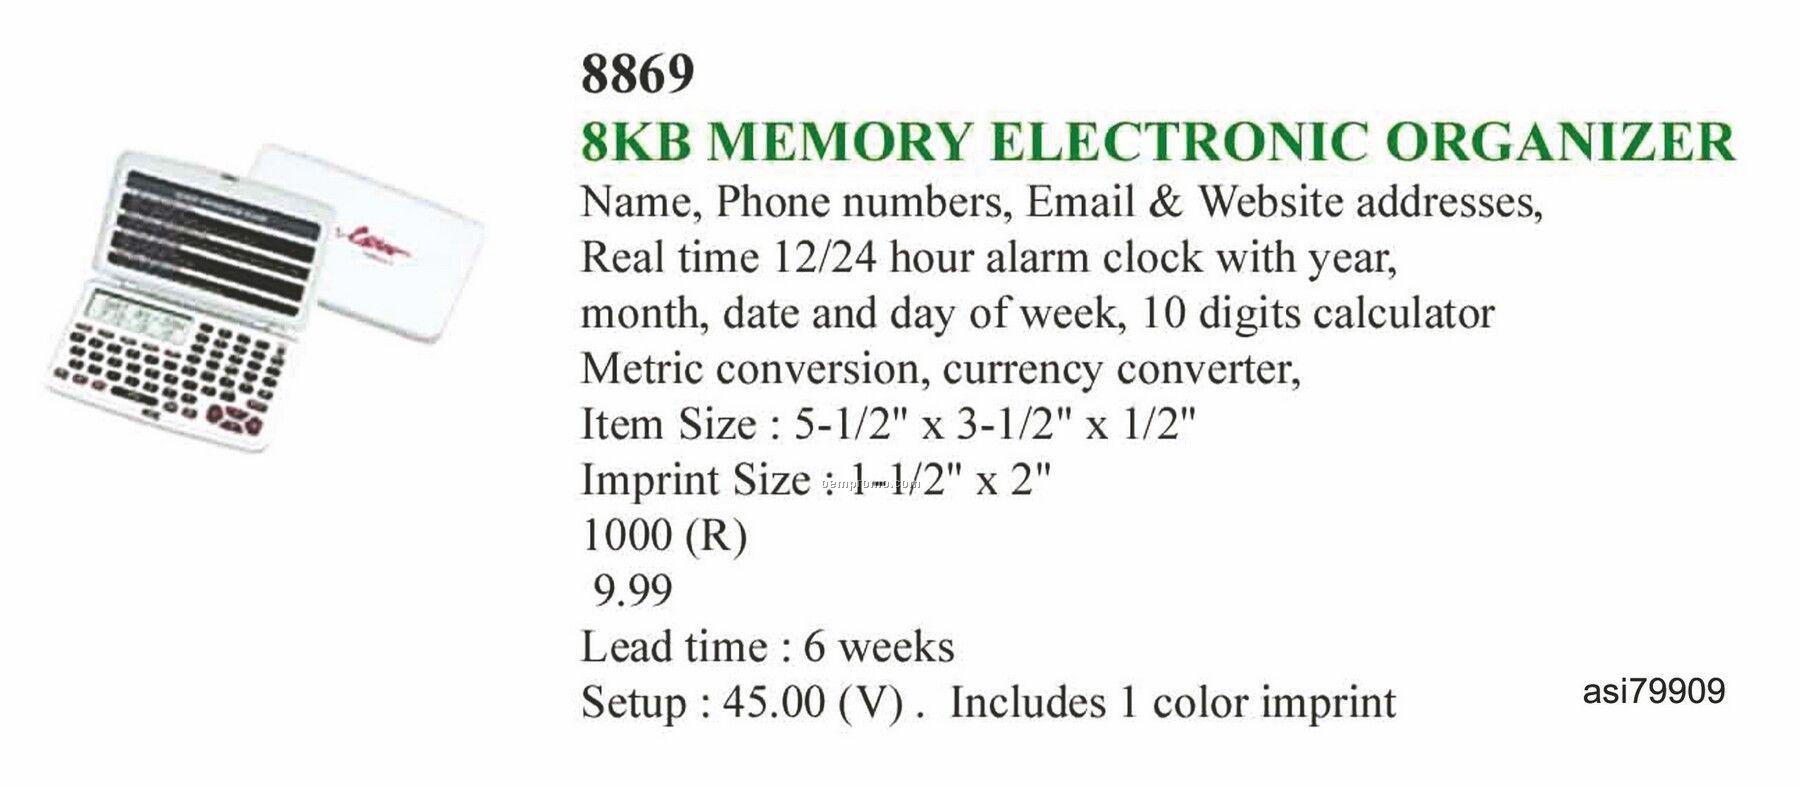 Promotekinc 8k Memory Electronic Organizer With Internet Directory